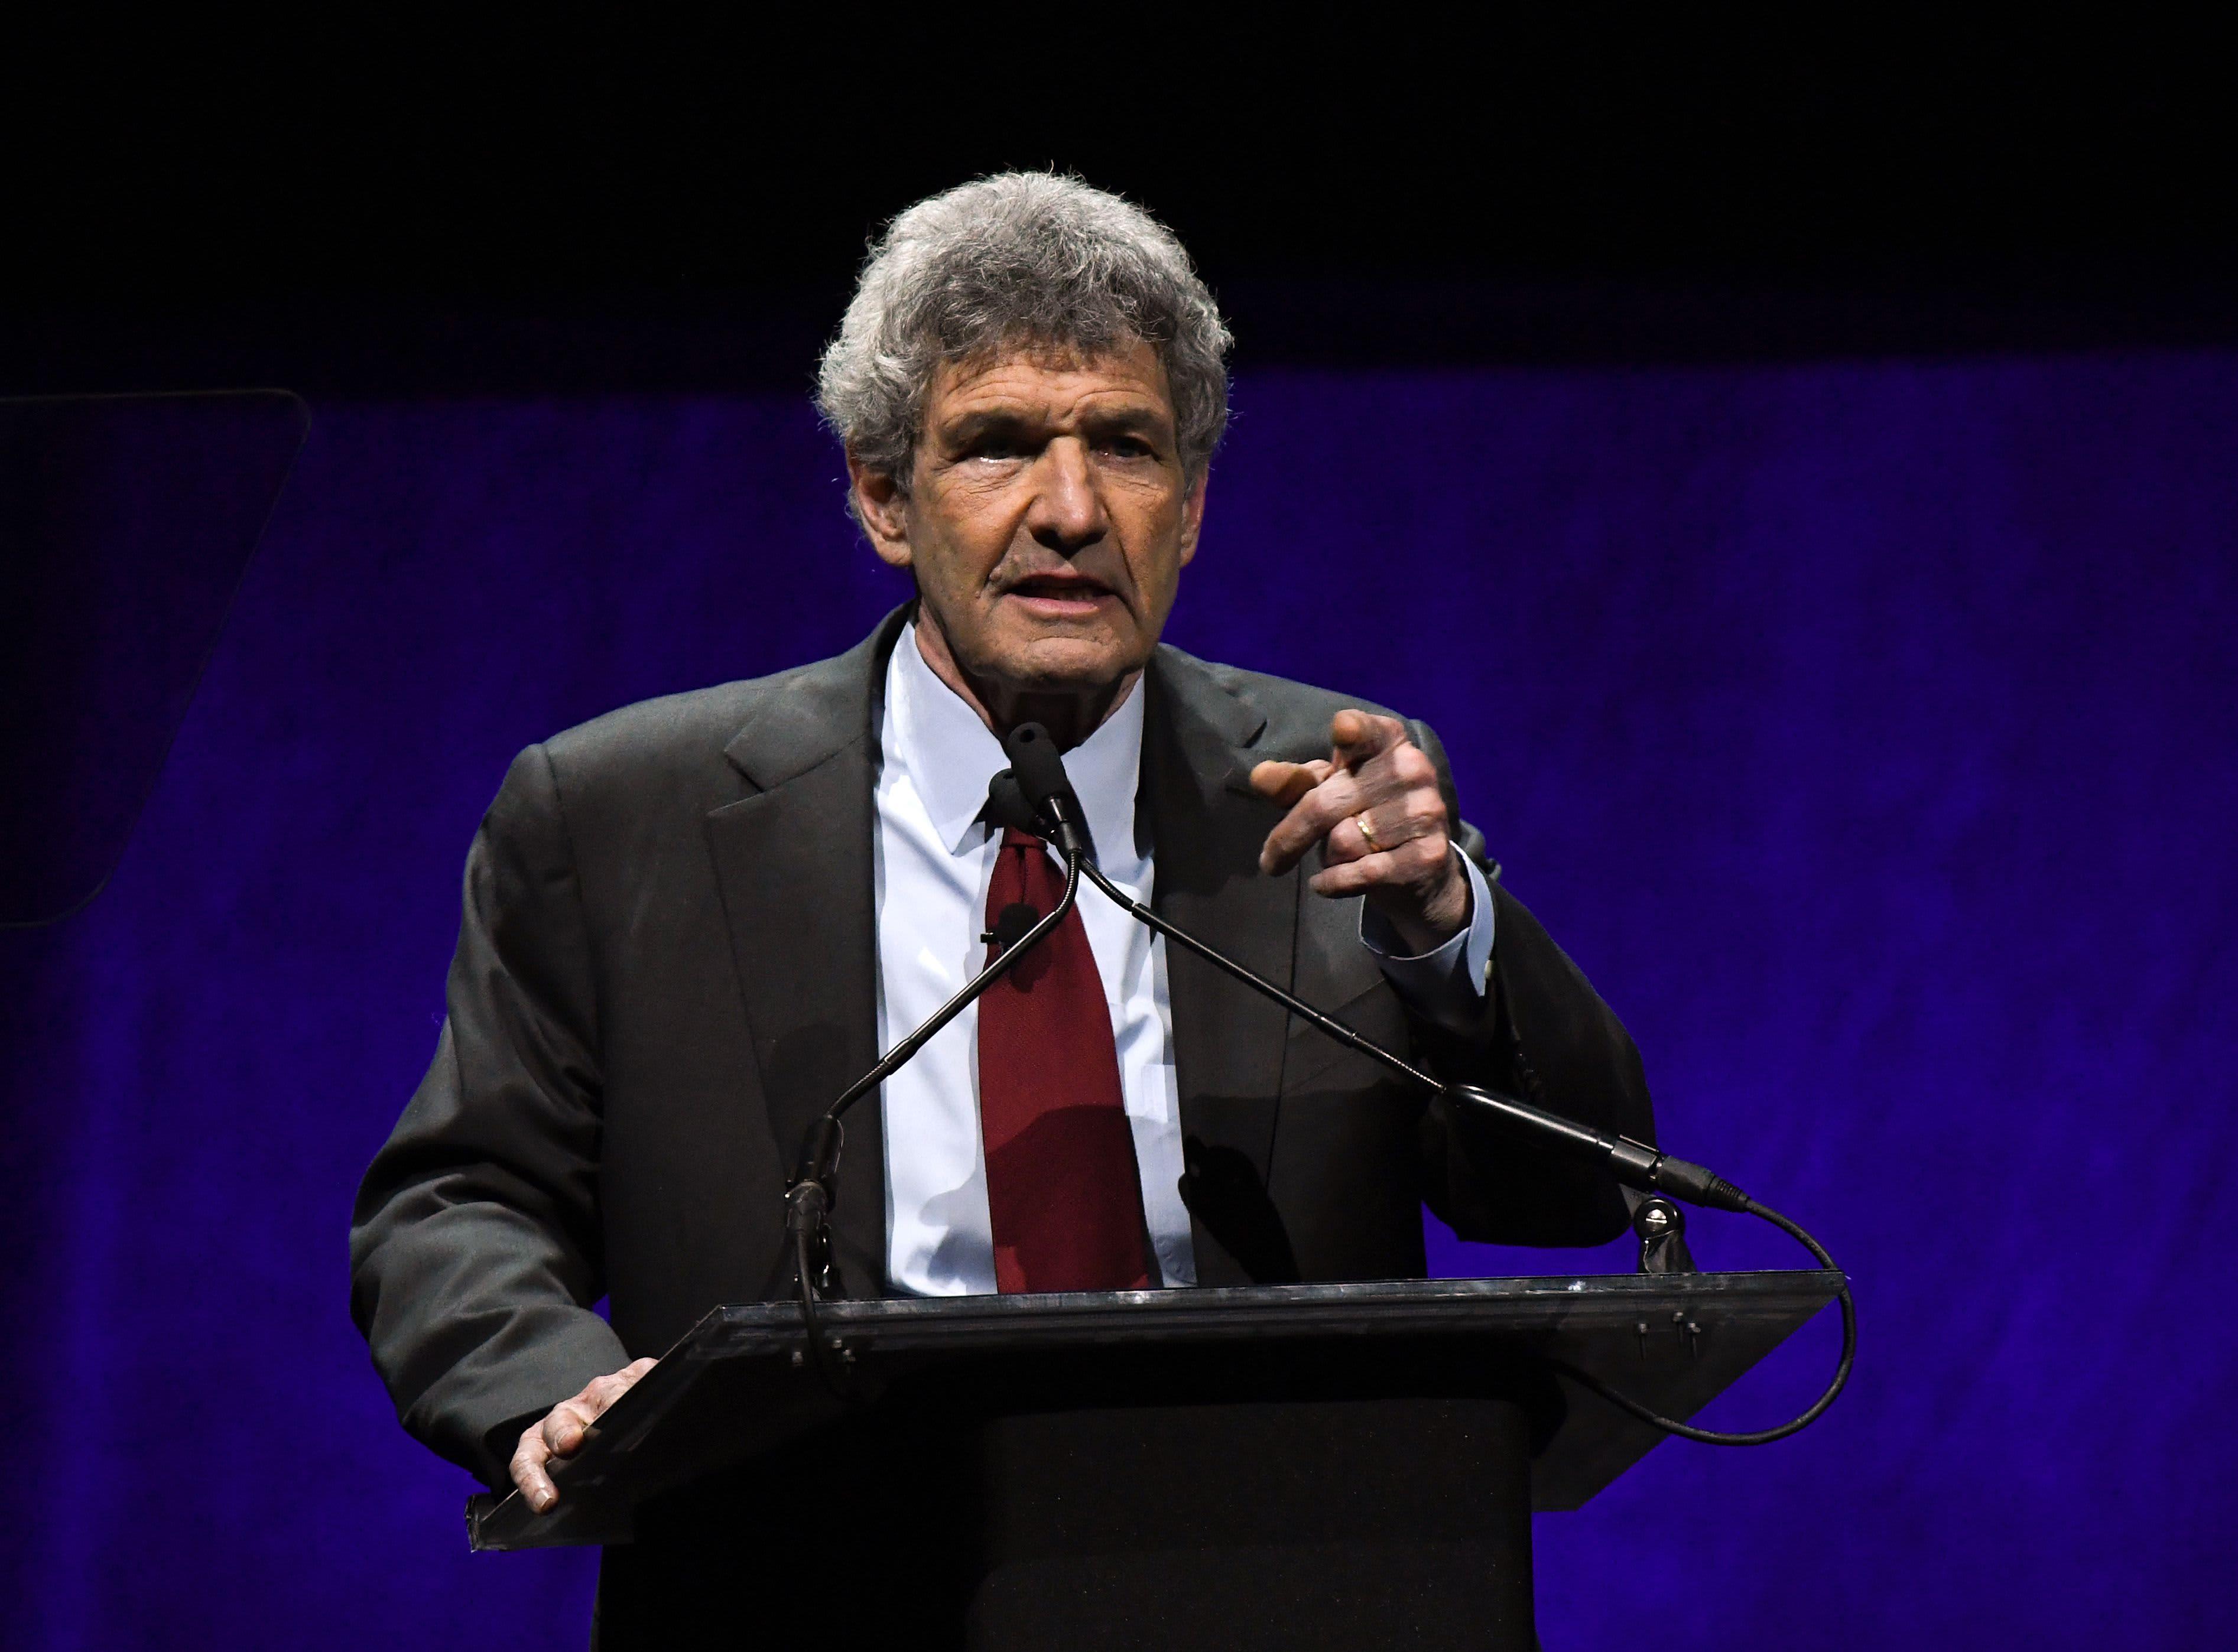 Disney Studios Chairman Alan Horn hosts fundraiser for Nancy Pelosi and House Democrats